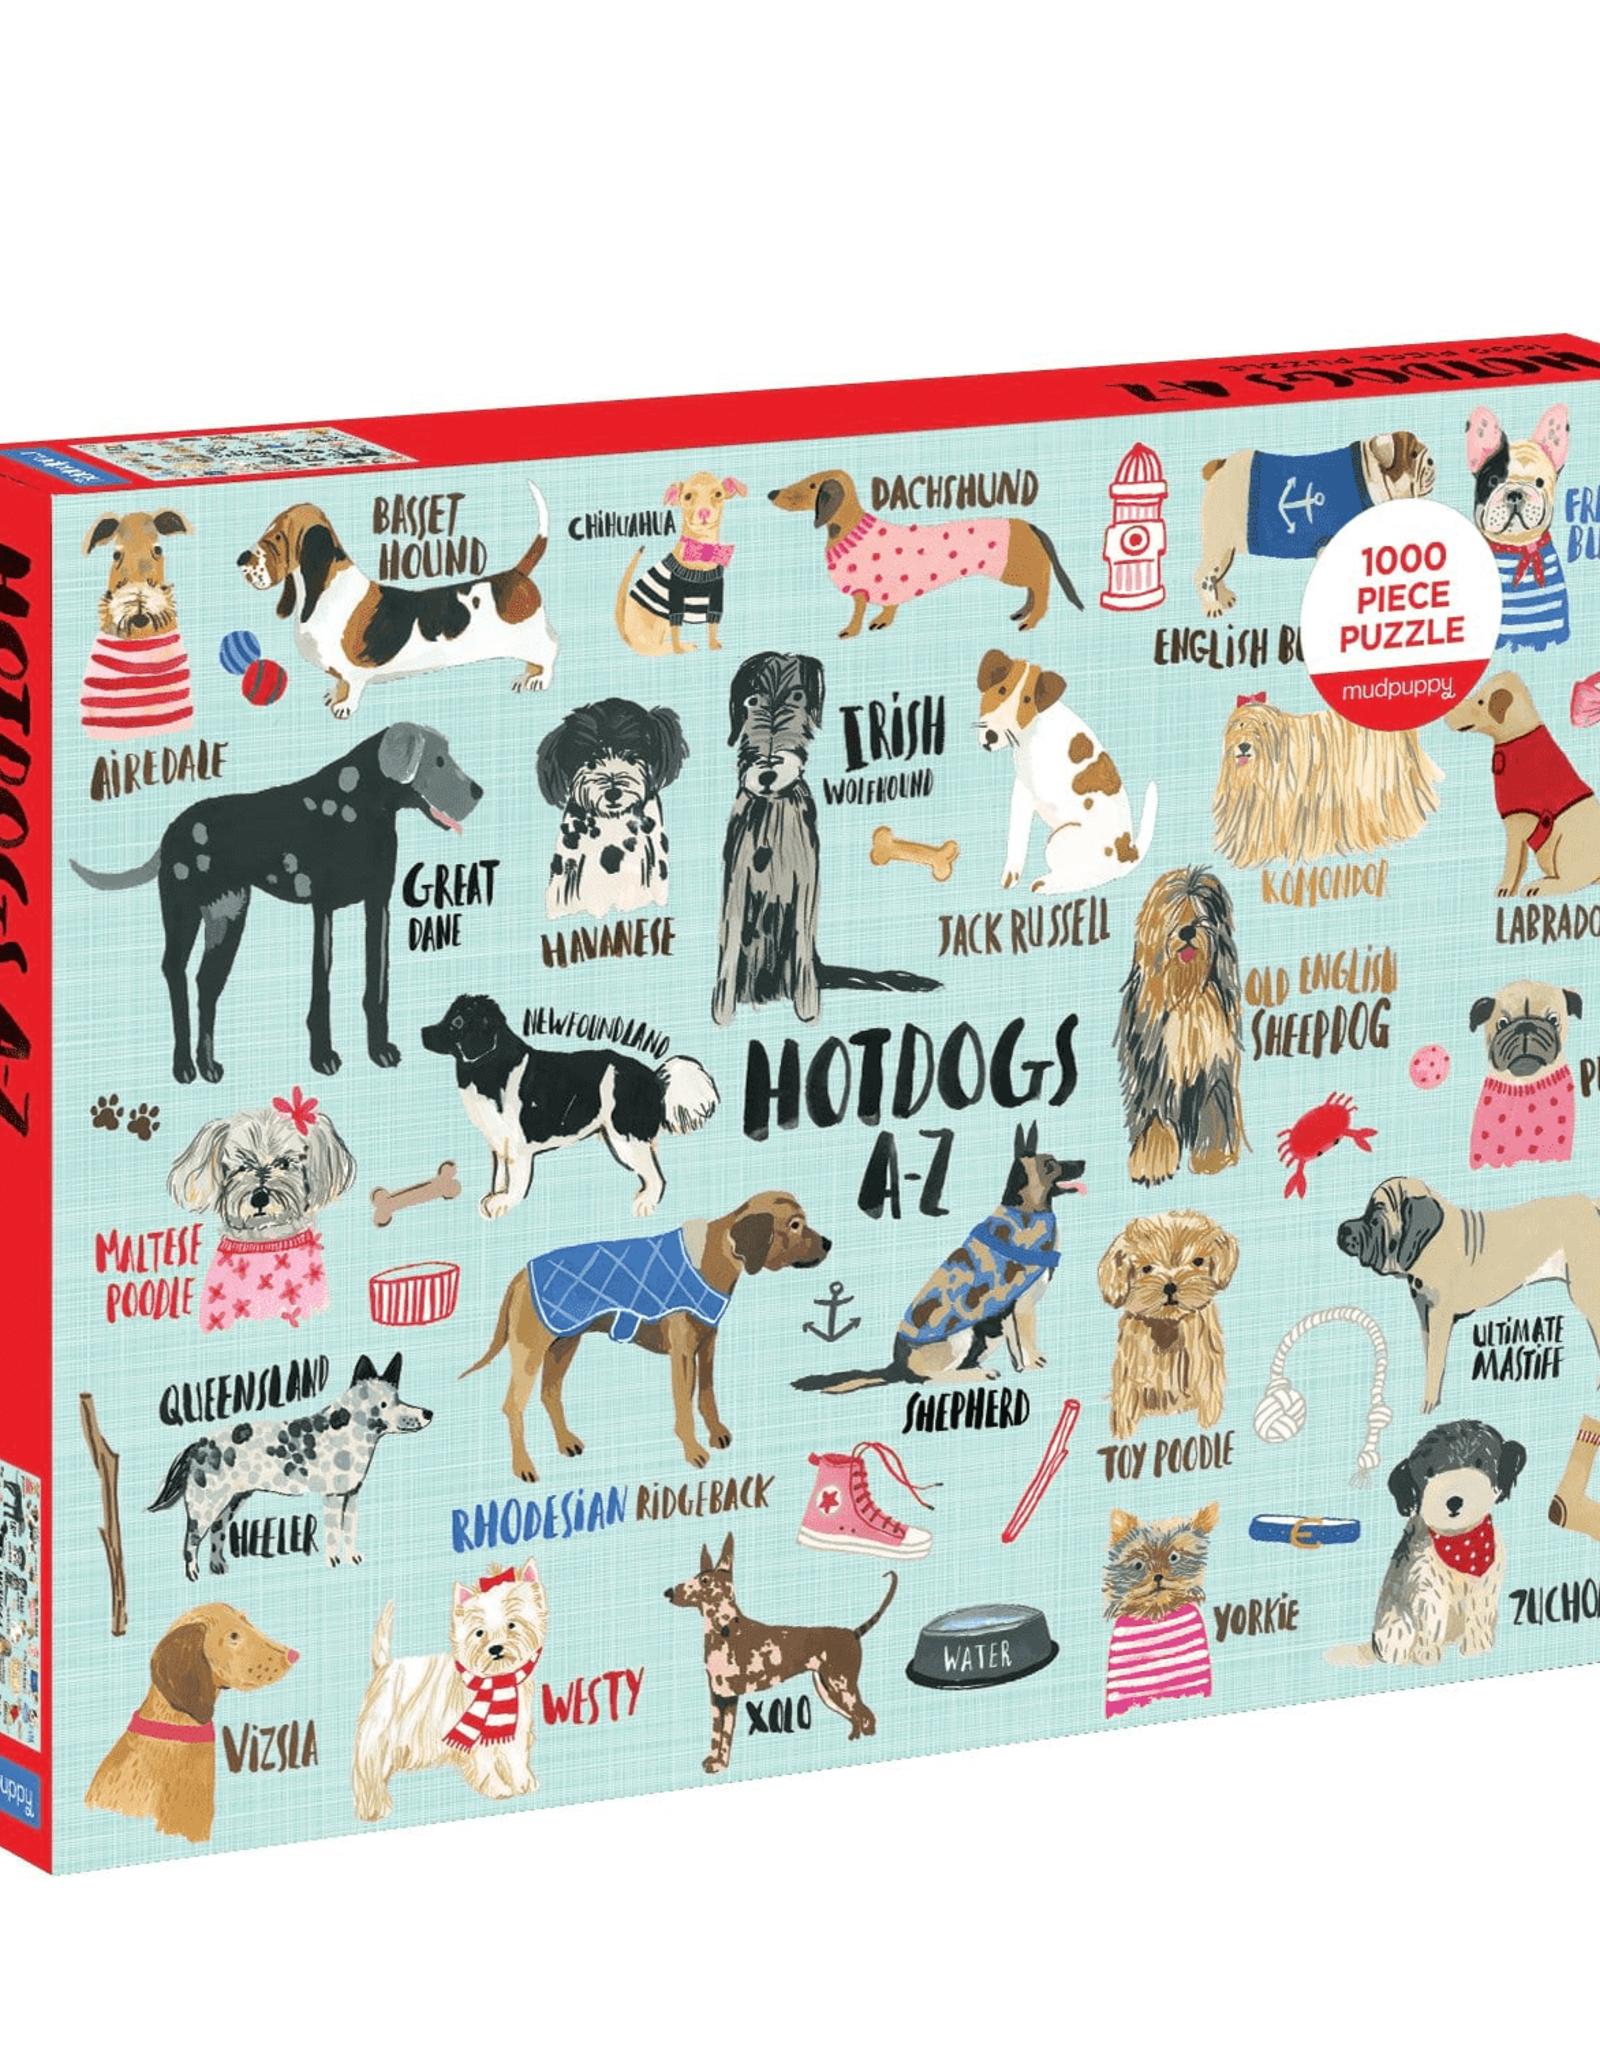 Mudpuppy Hot Dogs A-Z 1000 Piece Puzzle